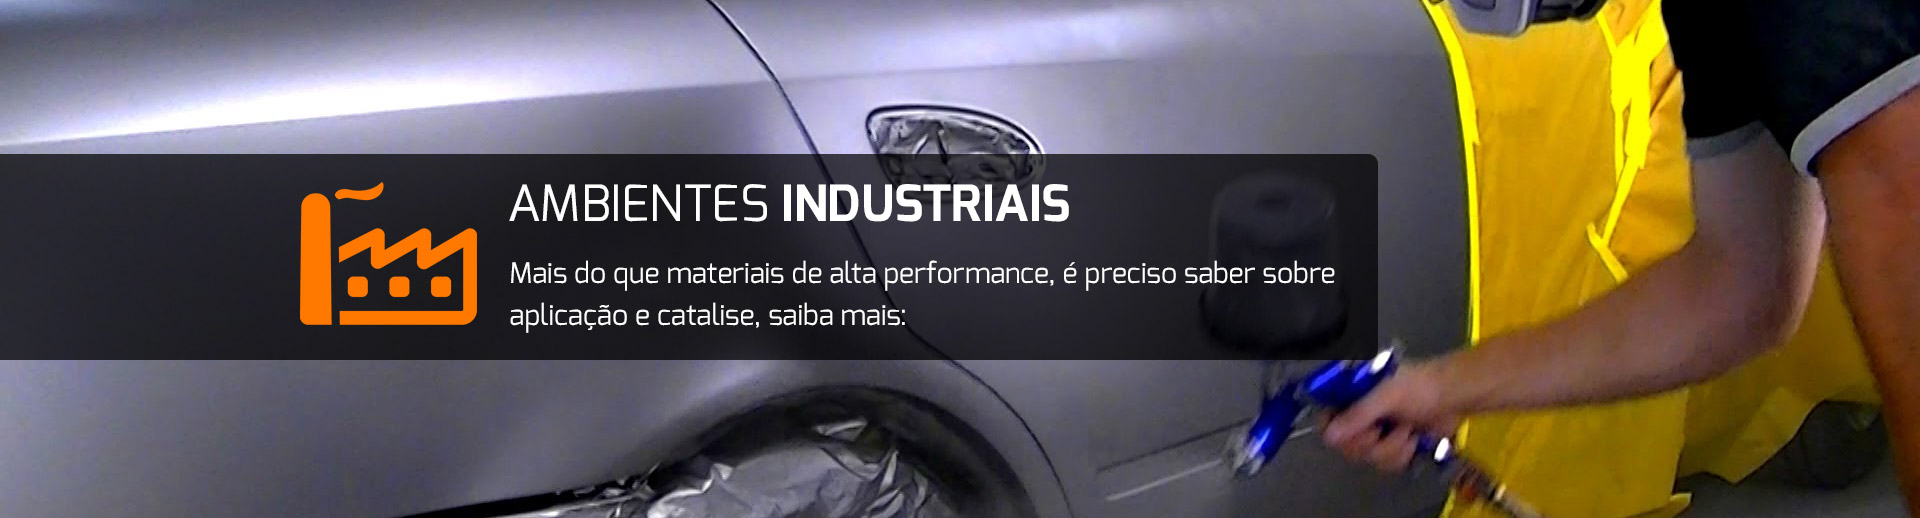 Ambientes Industriais